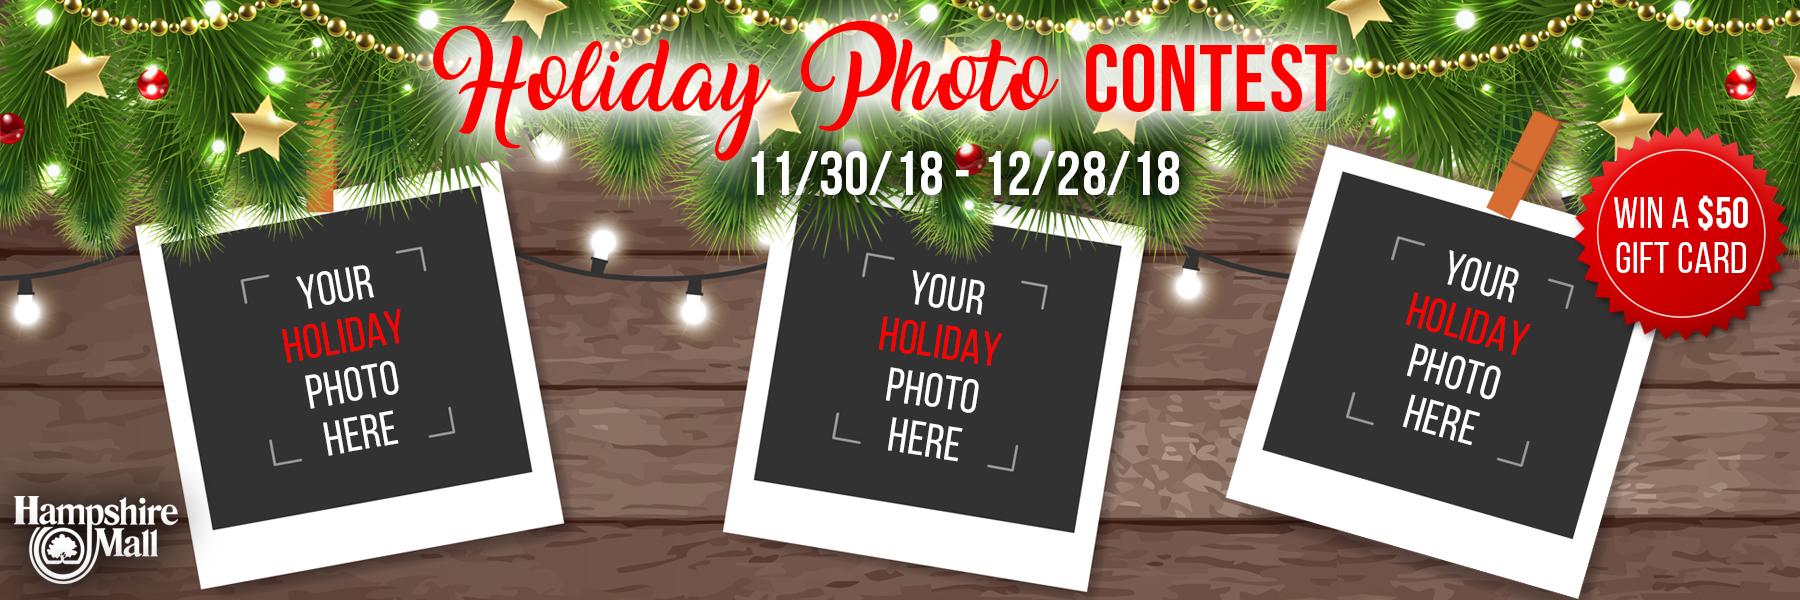 12 4 Hampshire photo contest